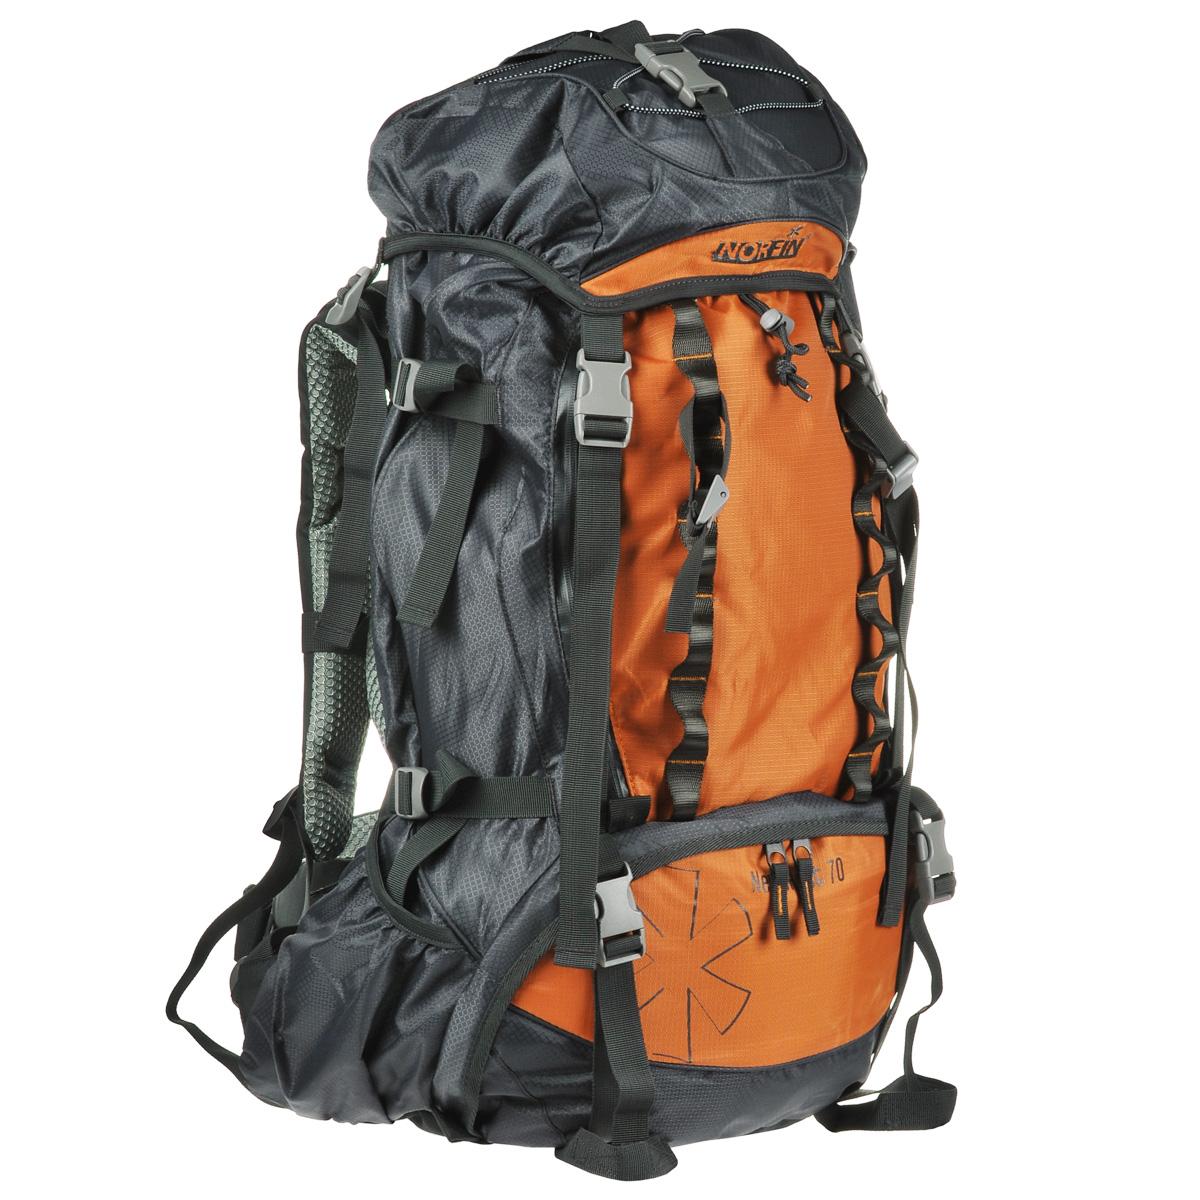 Рюкзак туристический Norfin  NeweRest , цвет: серый, оранжевый, 70 л - Туристические рюкзаки